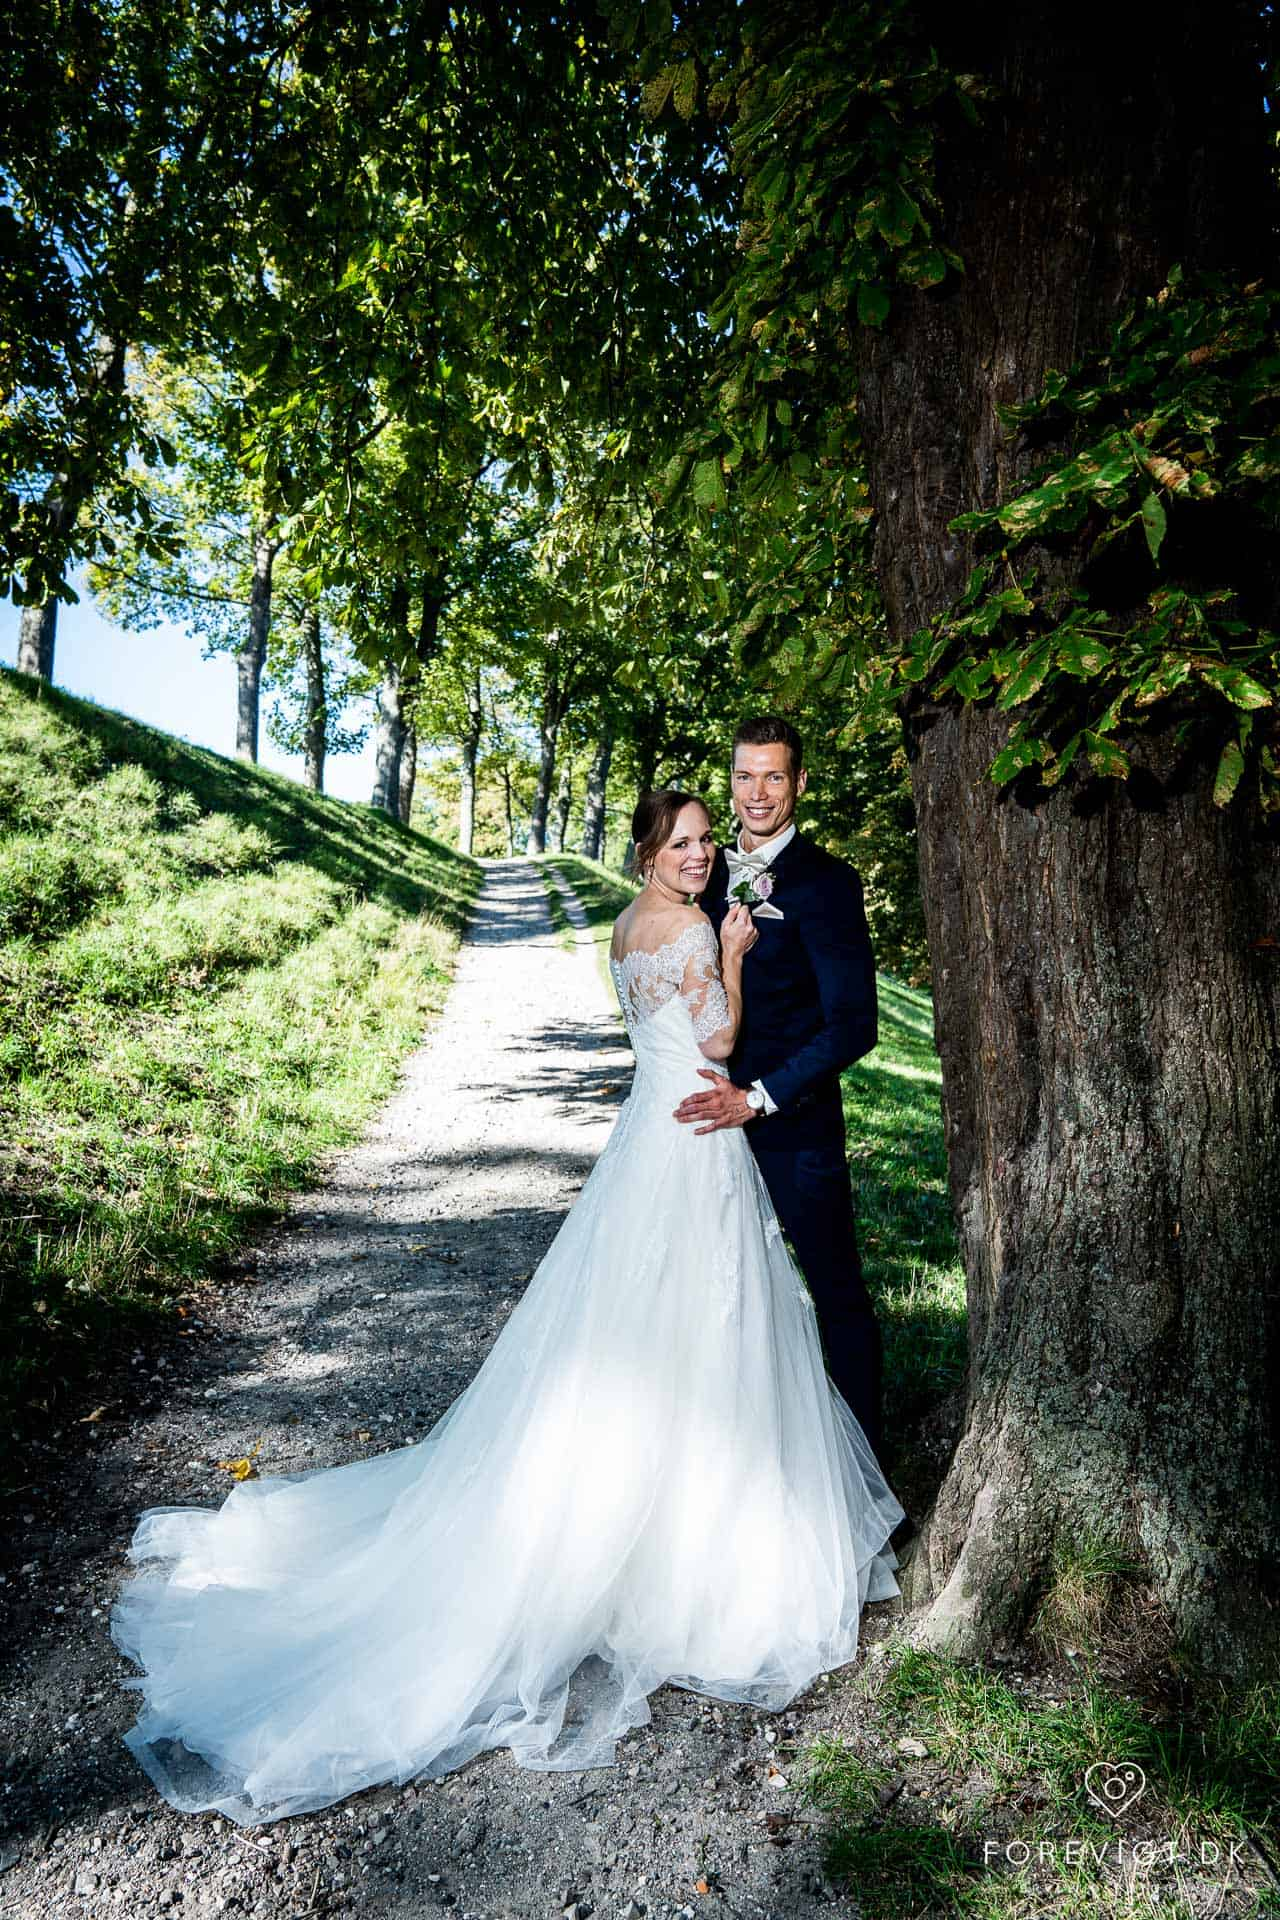 Bryllupsportrætter i Odense